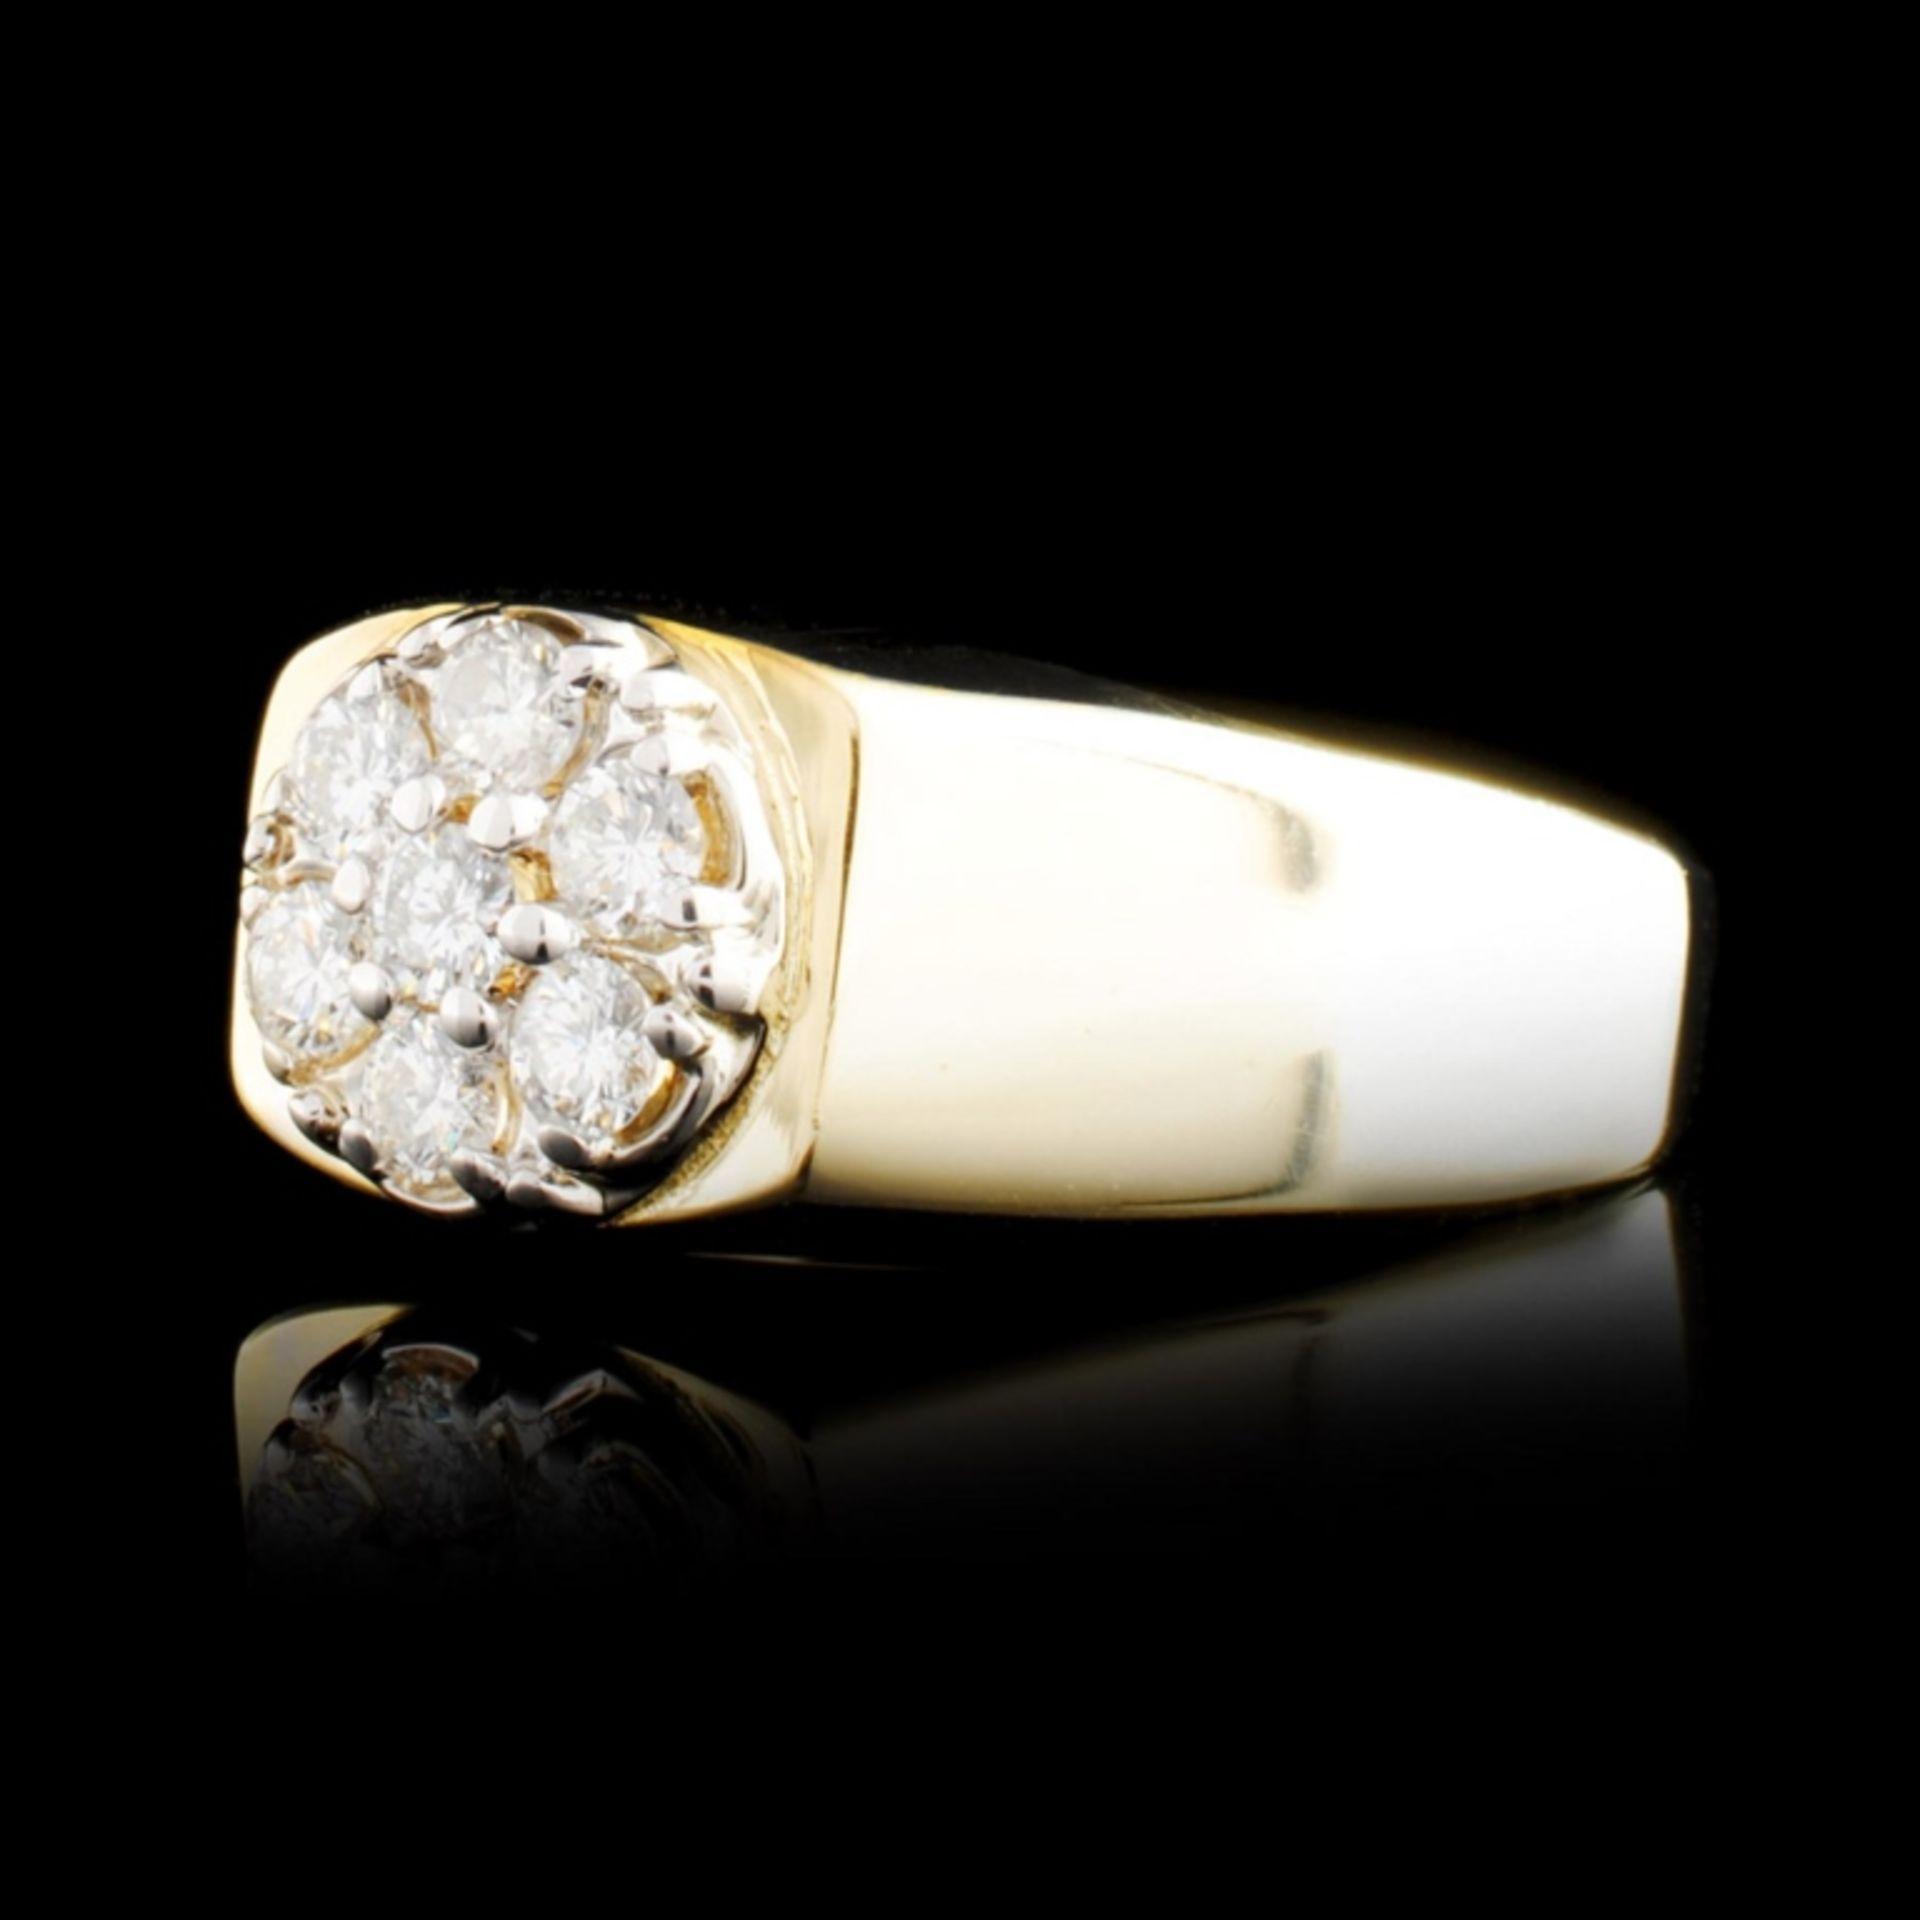 14K Gold 0.28ctw Diamond Ring - Image 2 of 5